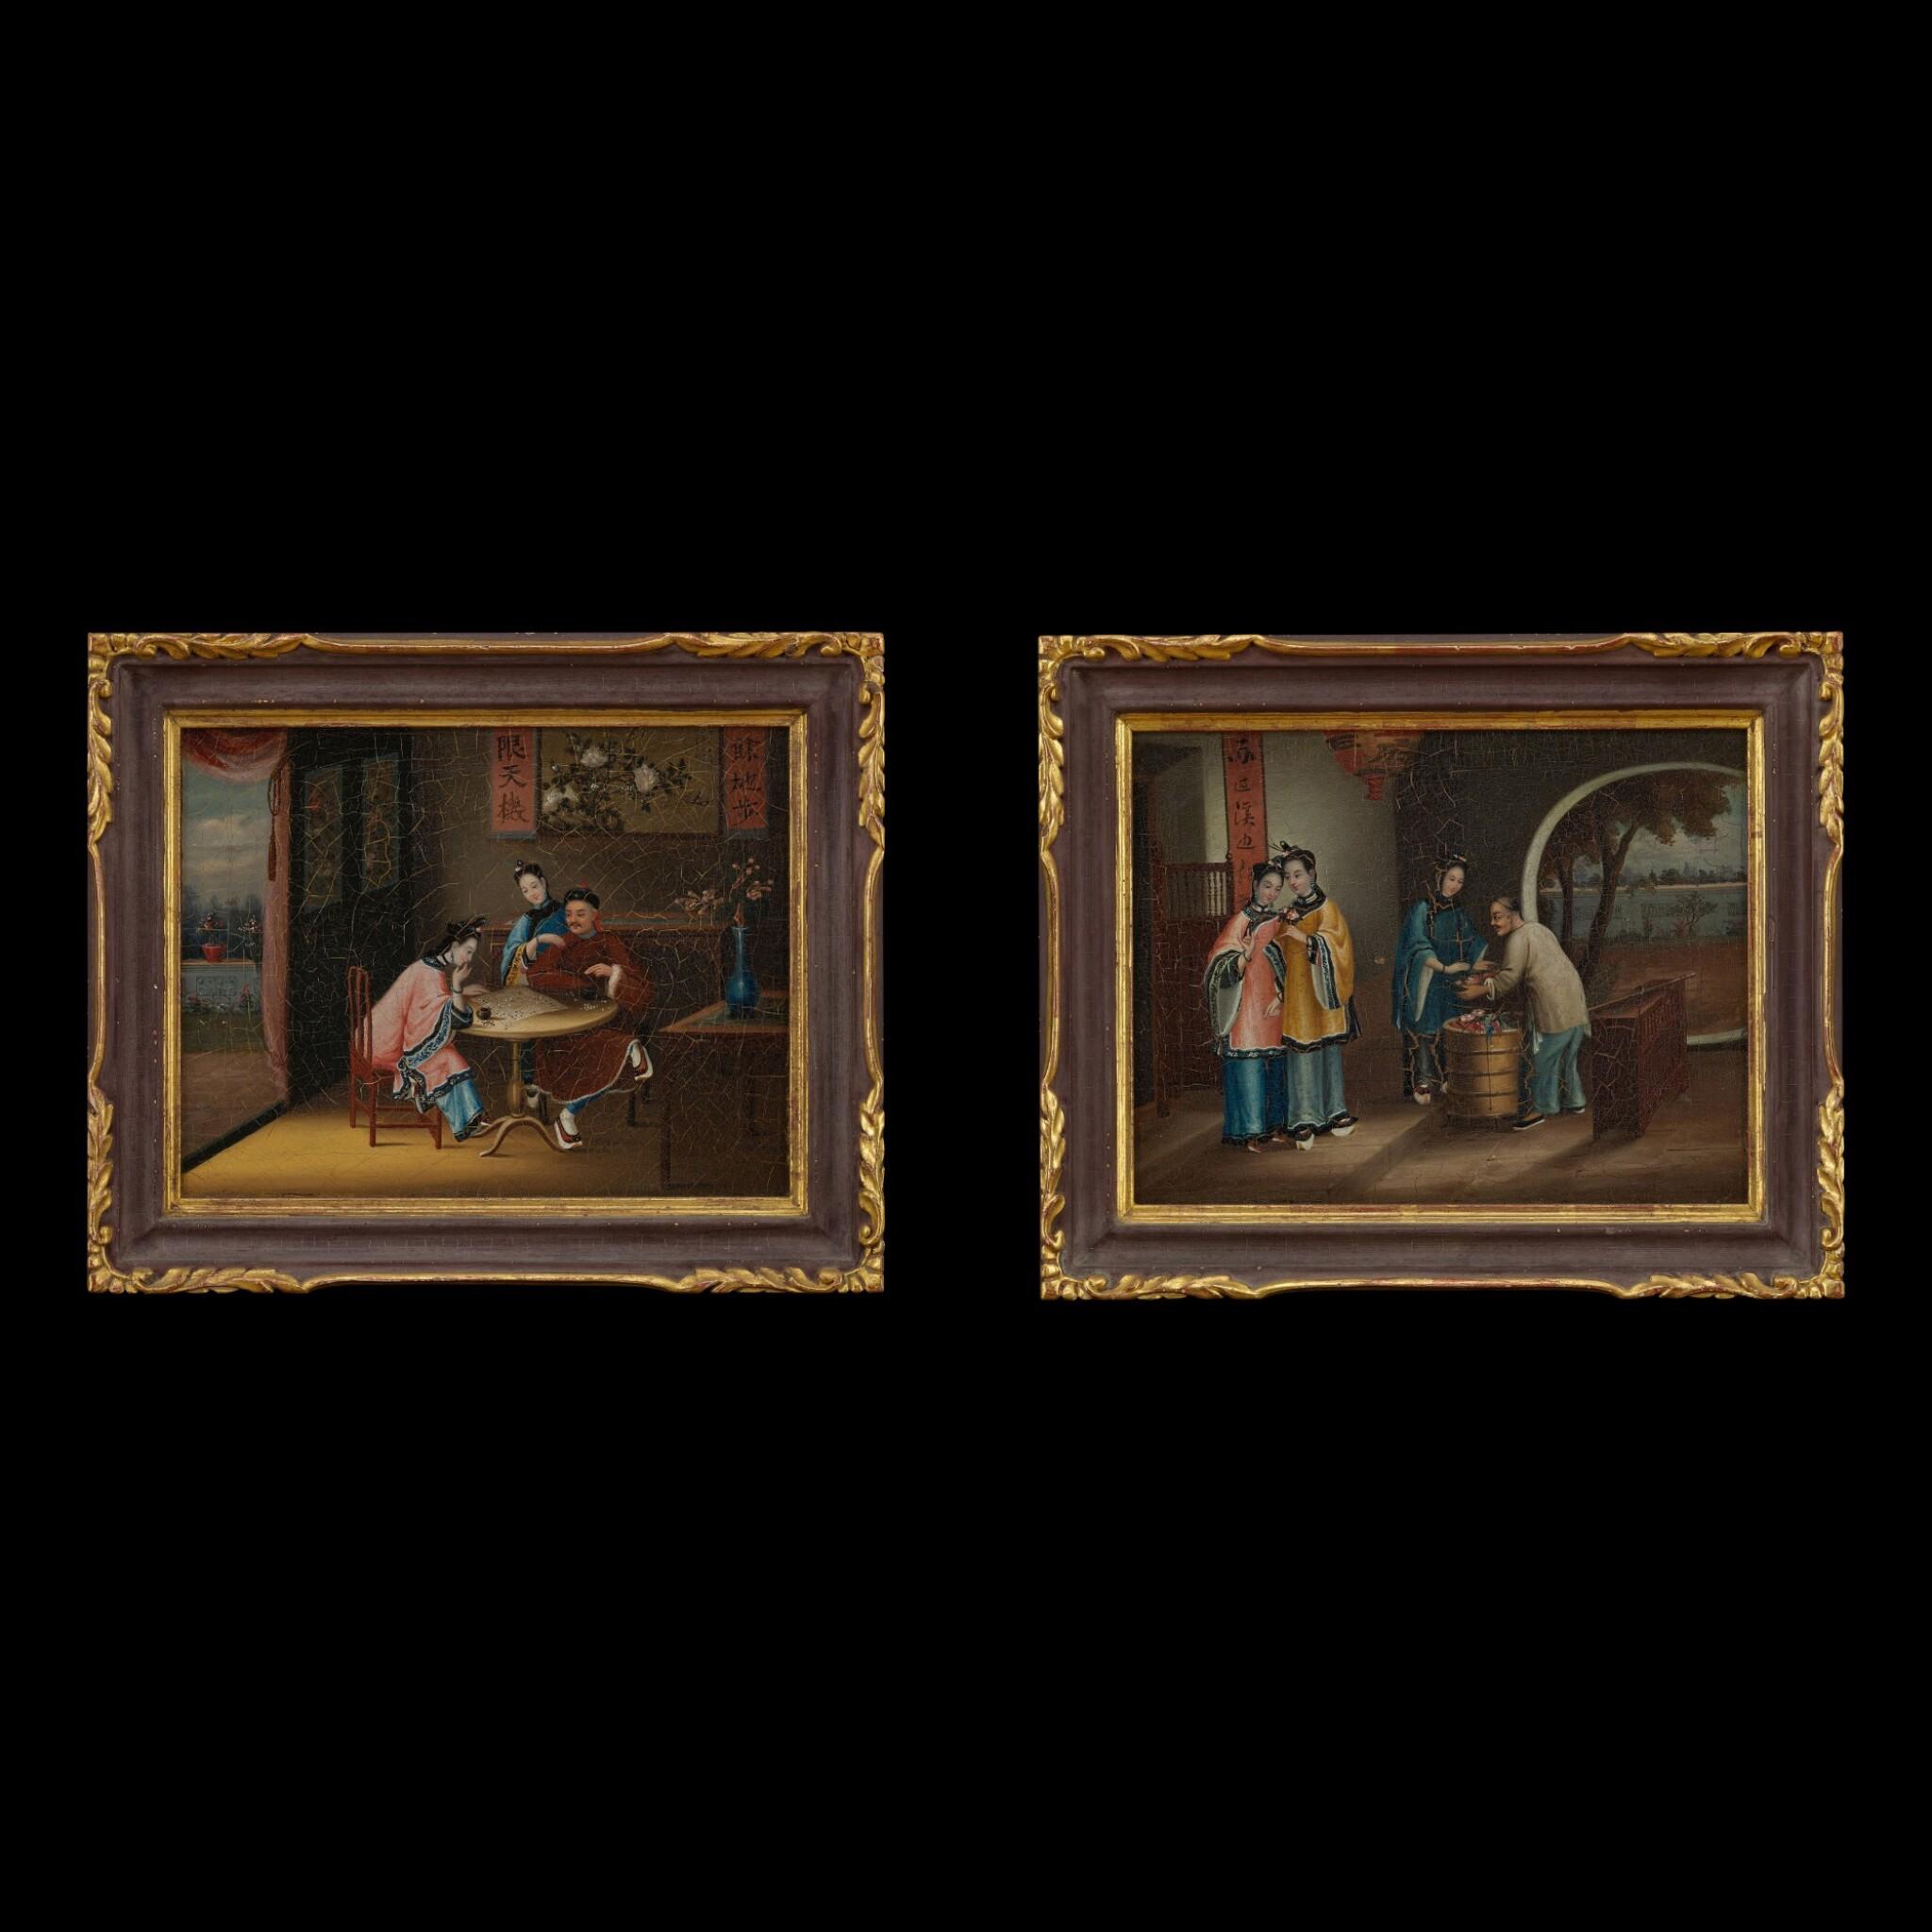 View full screen - View 1 of Lot 184. Chinese School, mid 19th century Gentleman and Ladies Playing Chess and Ladies Buying Flowers | 中國畫派 十九世紀中葉   對弈圖、賣花圖一組兩幅 布本油畫 木框.